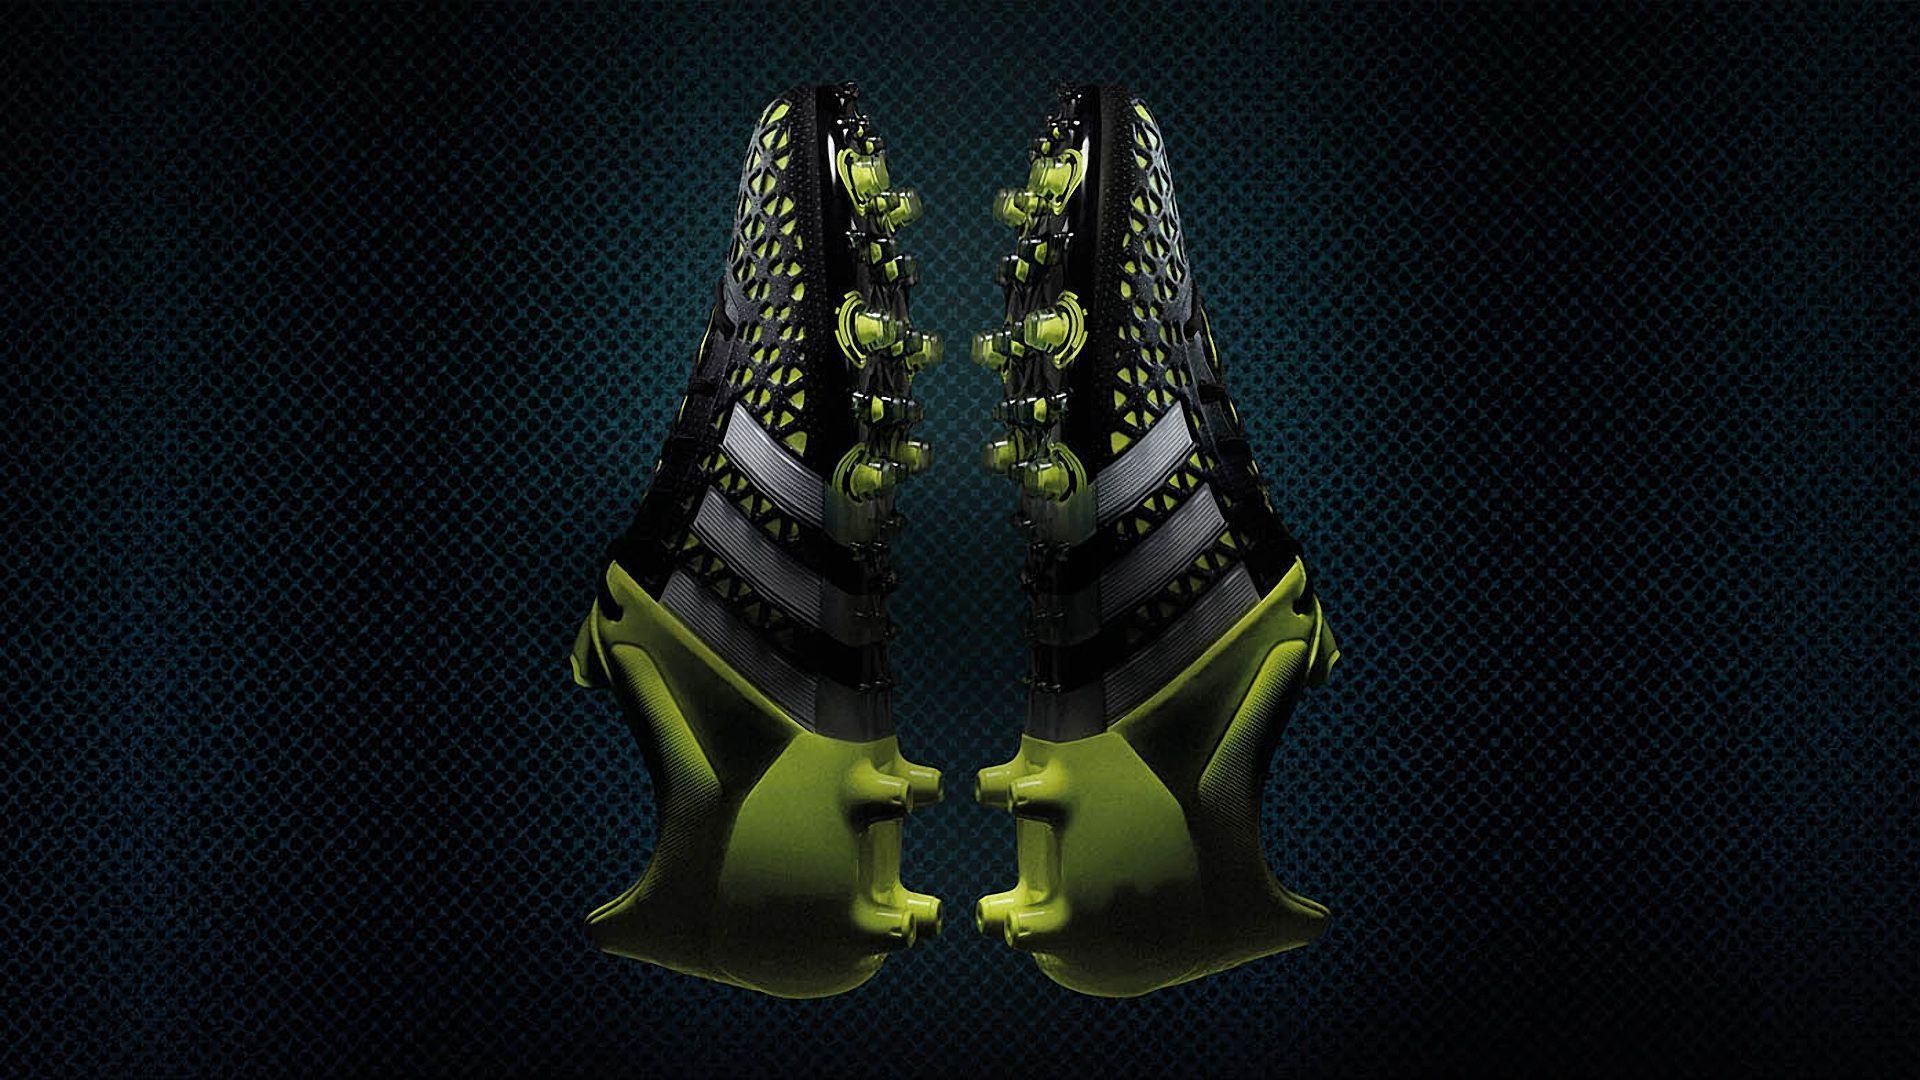 Adidas football wallpaper hd